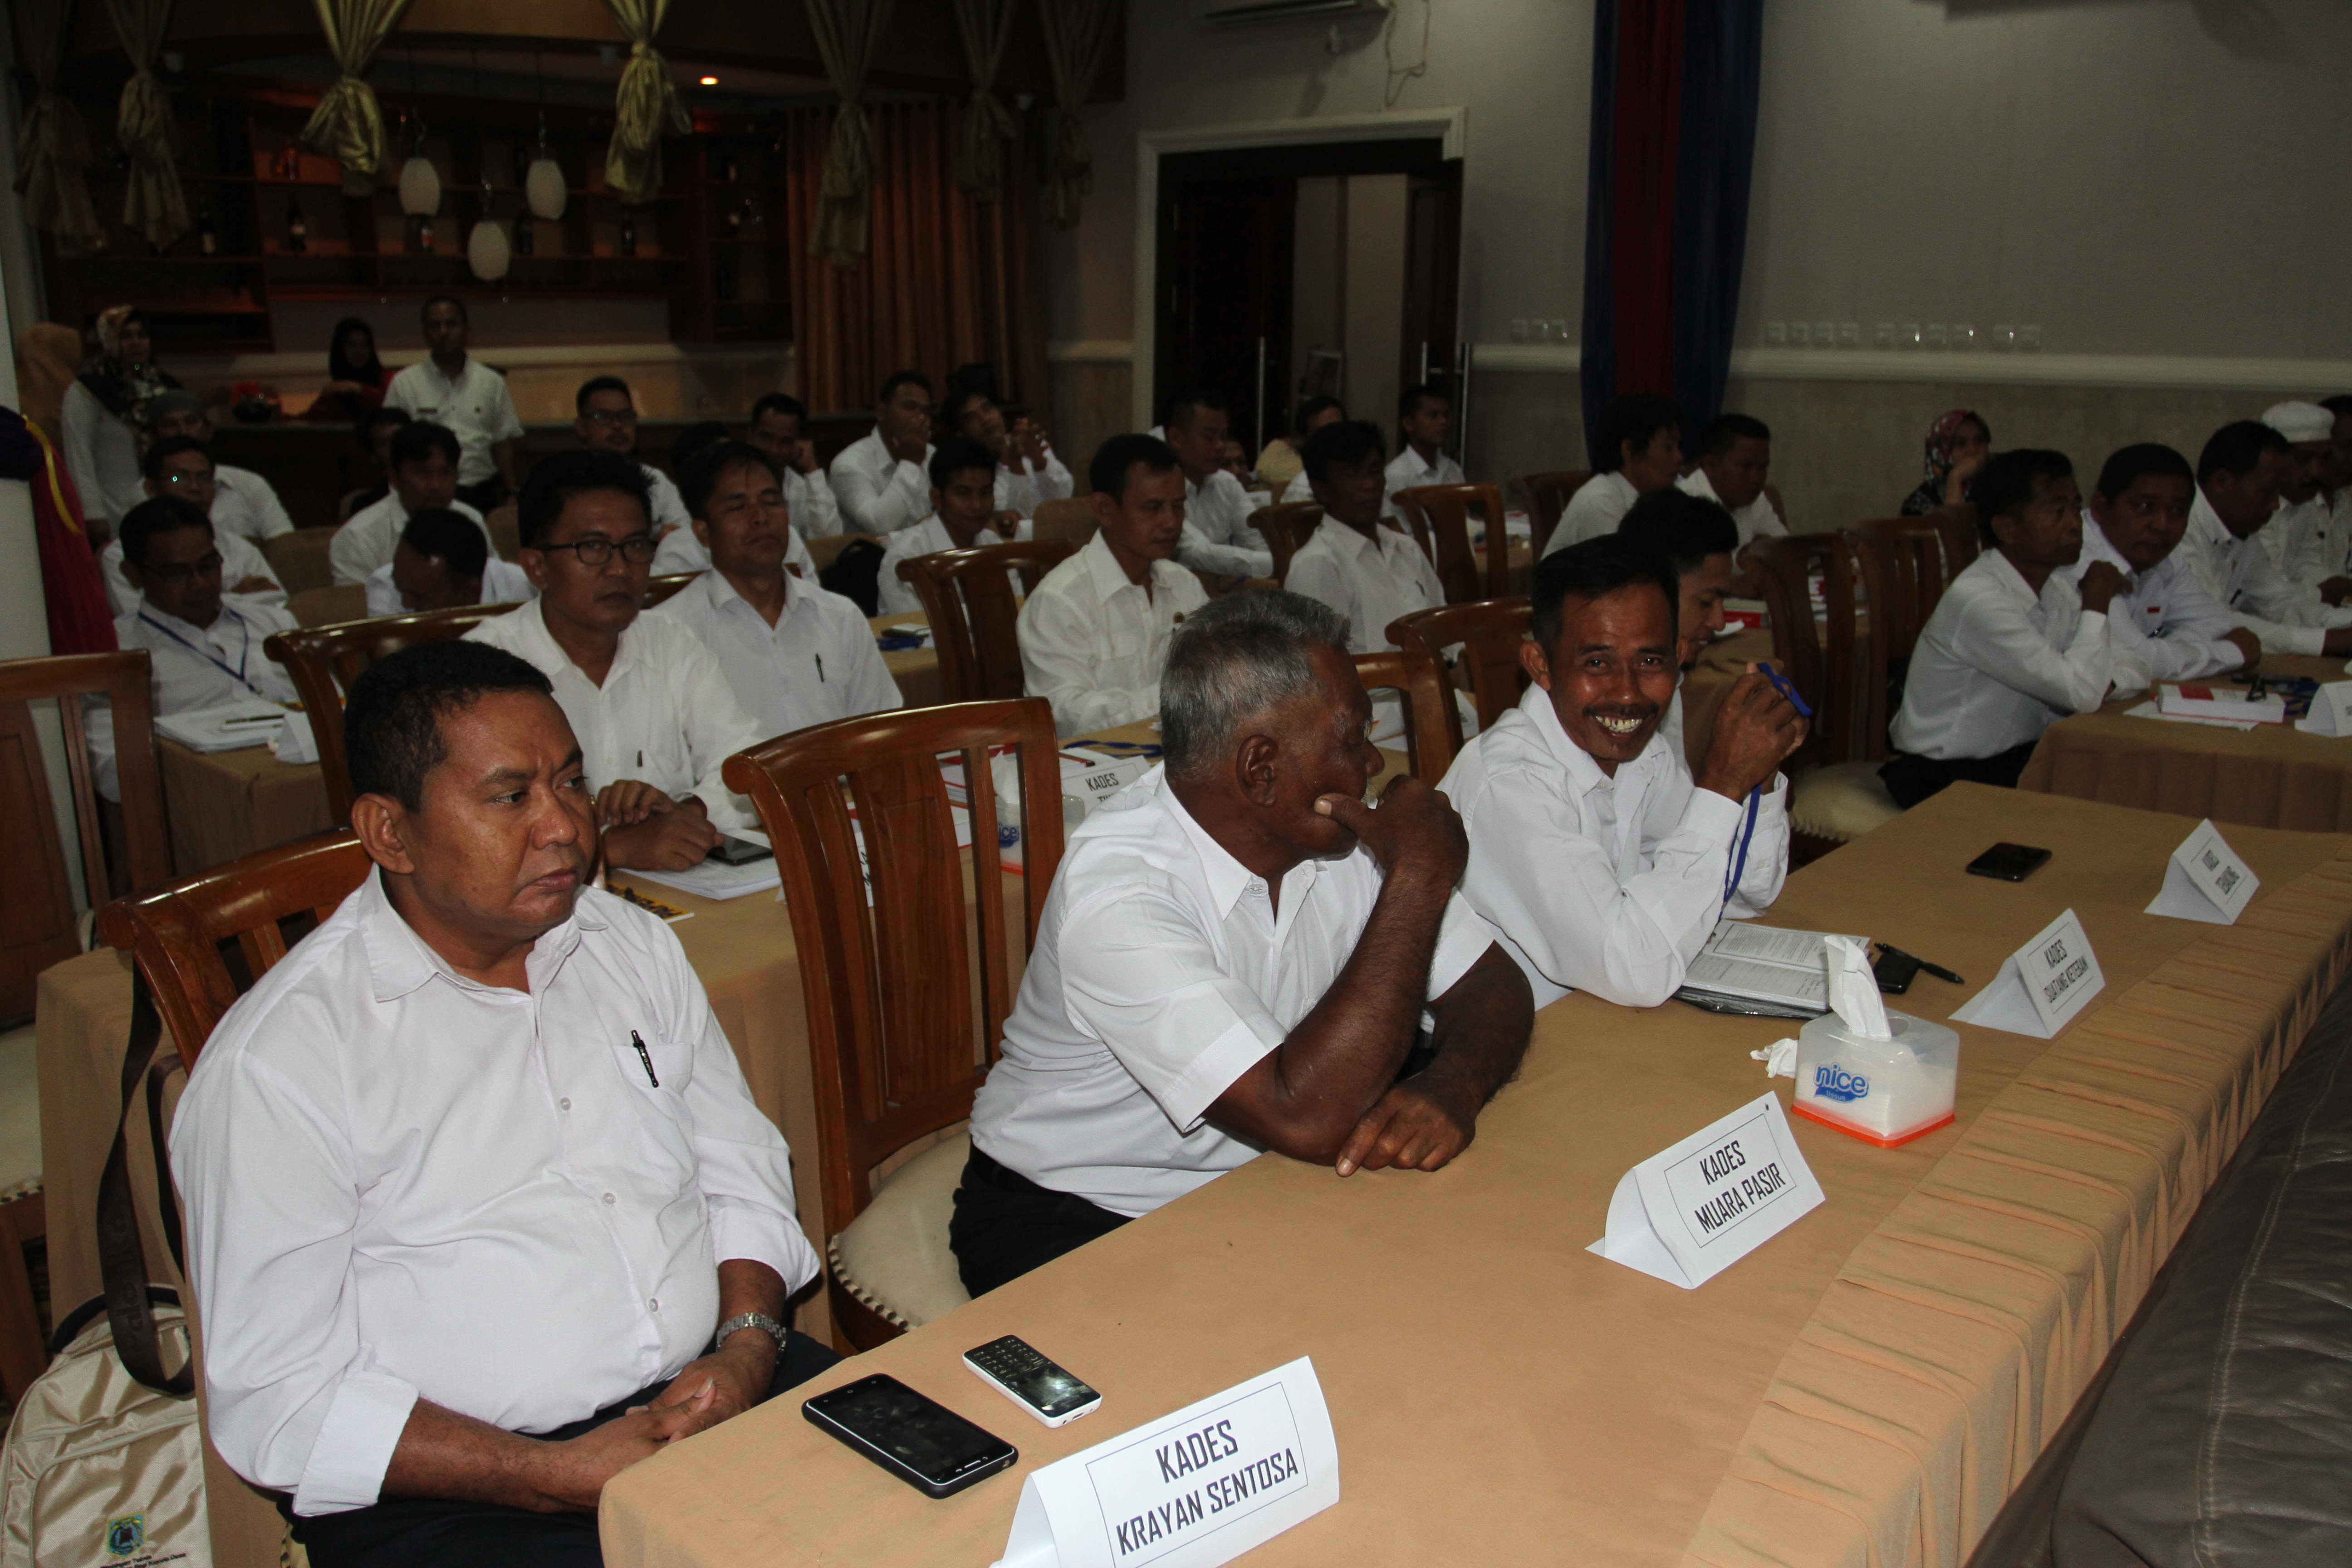 Wabup: Pemkab Selalu Wujudkan Kesejahteraan Masyarakat  Melalui Pemberdayaan Masyarakat dan Desa